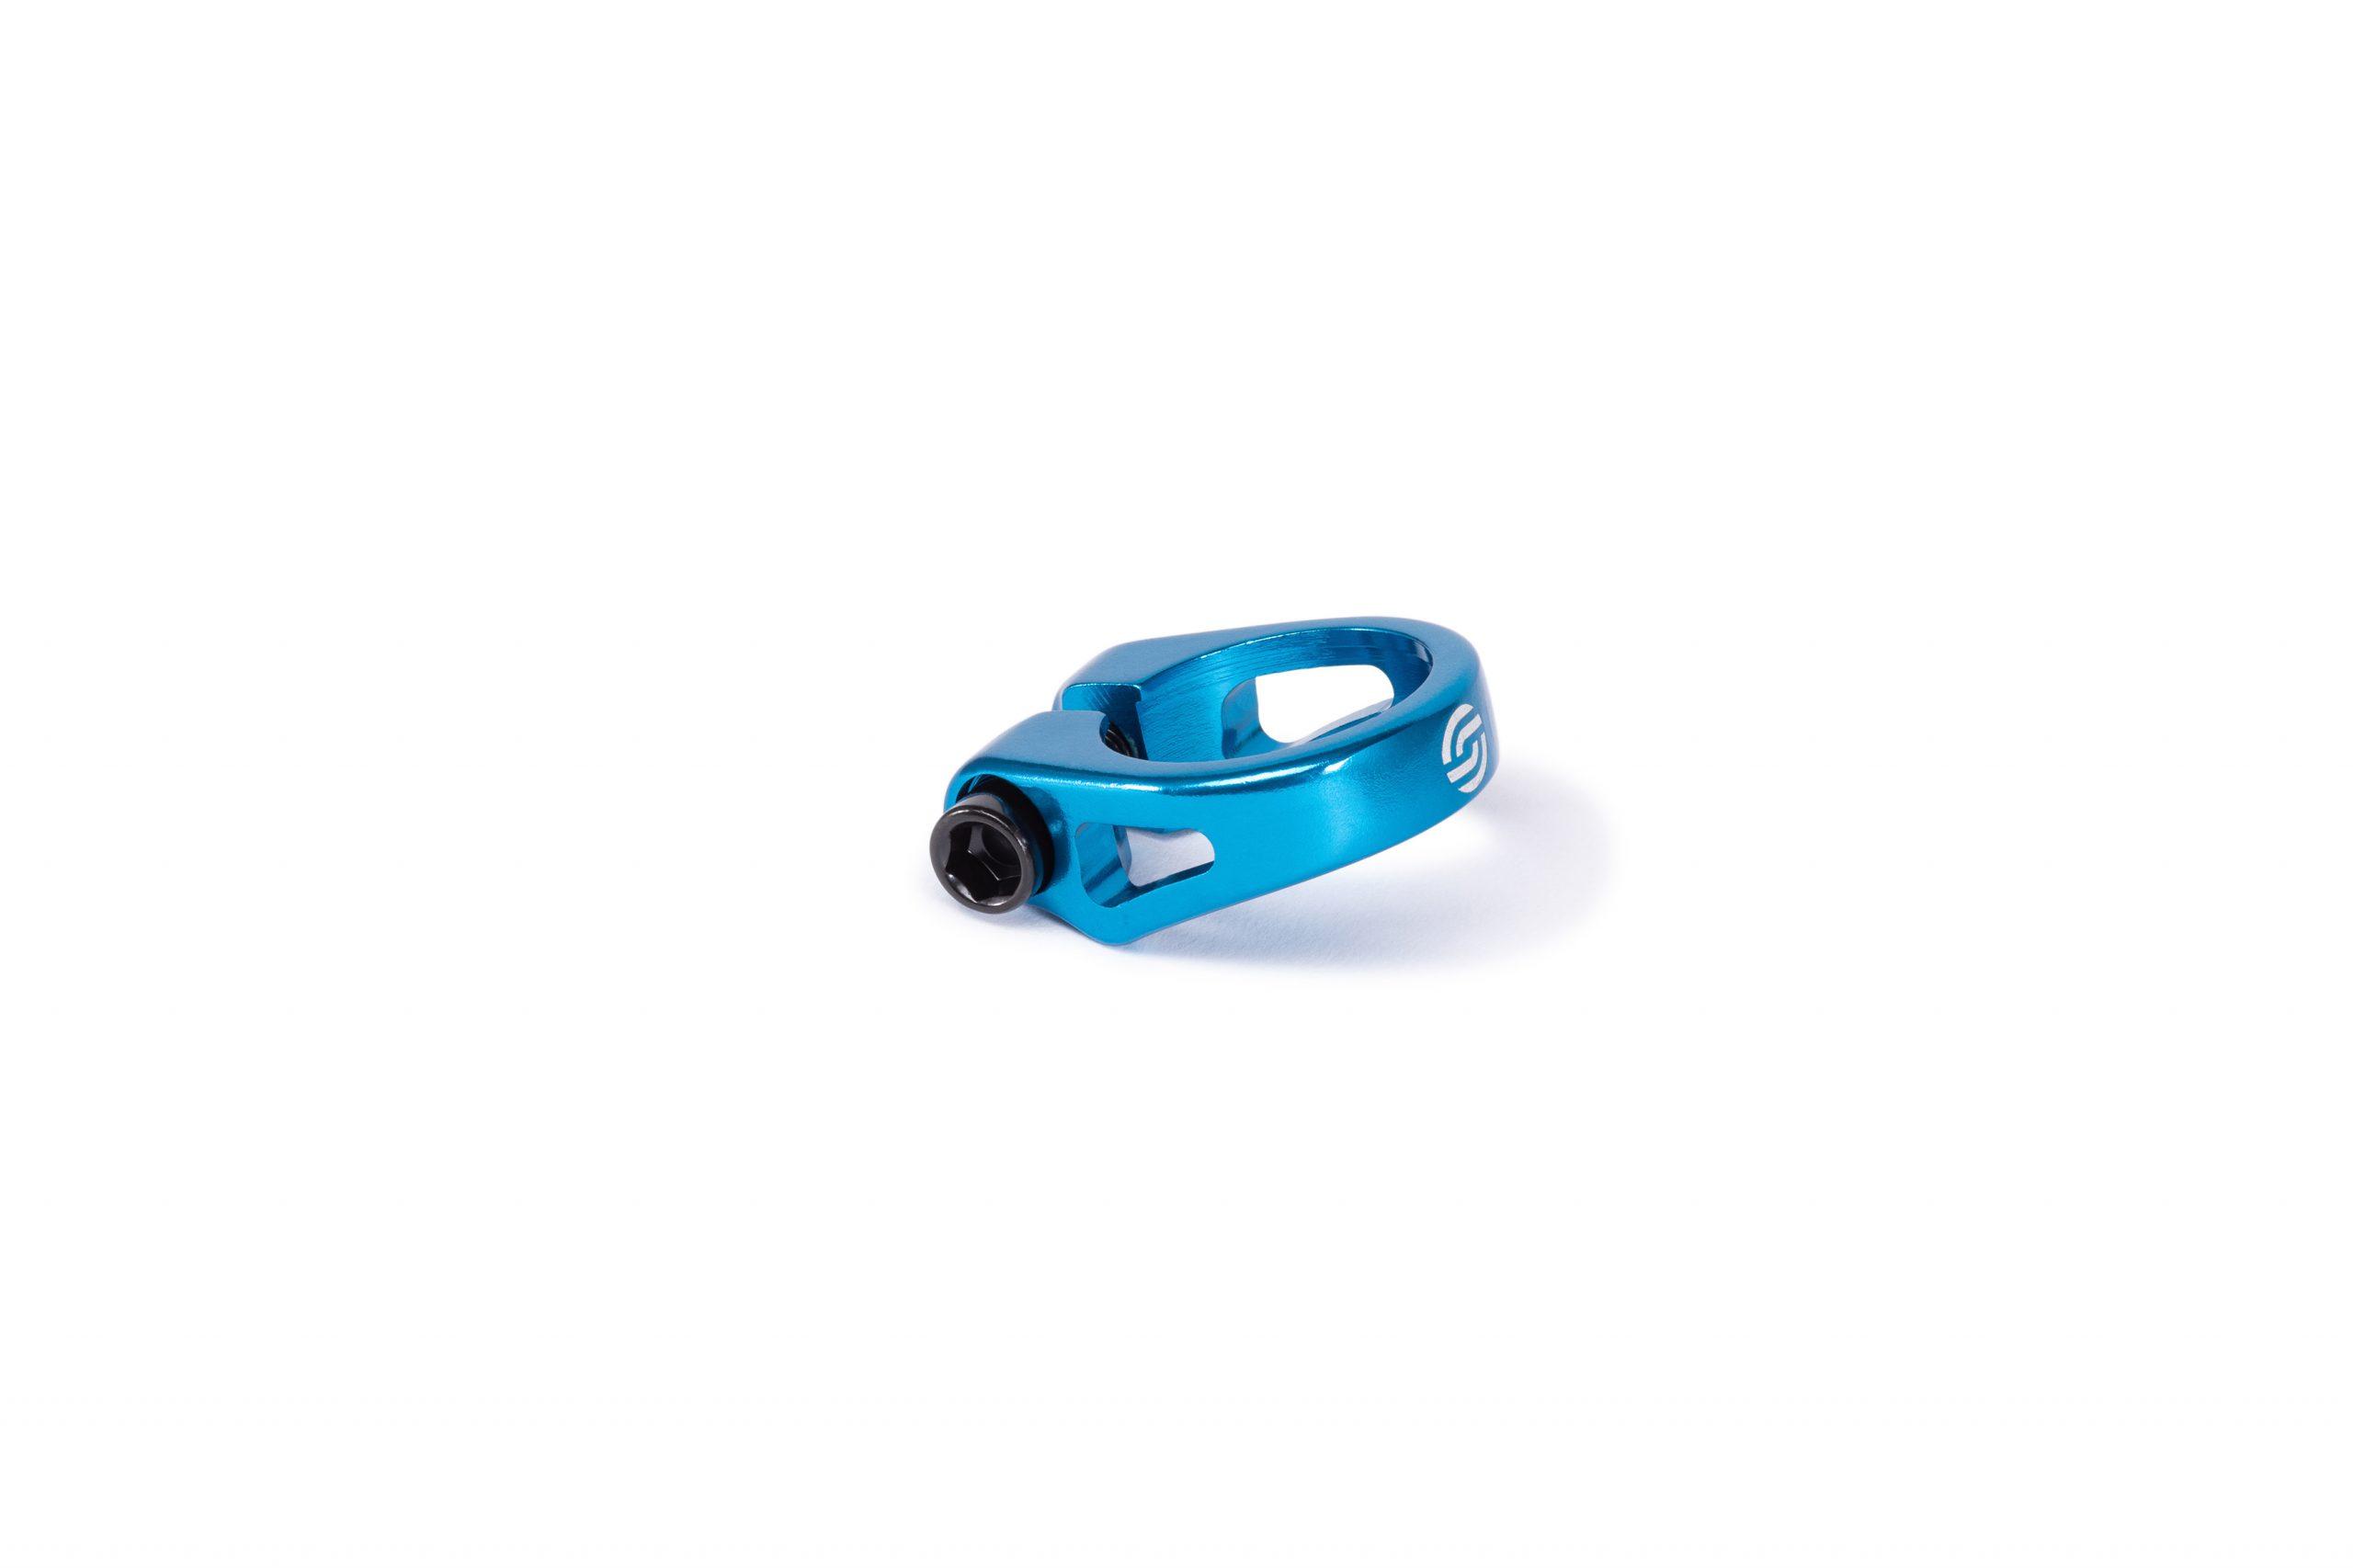 Salt_AM_seat_clamp_blue-01